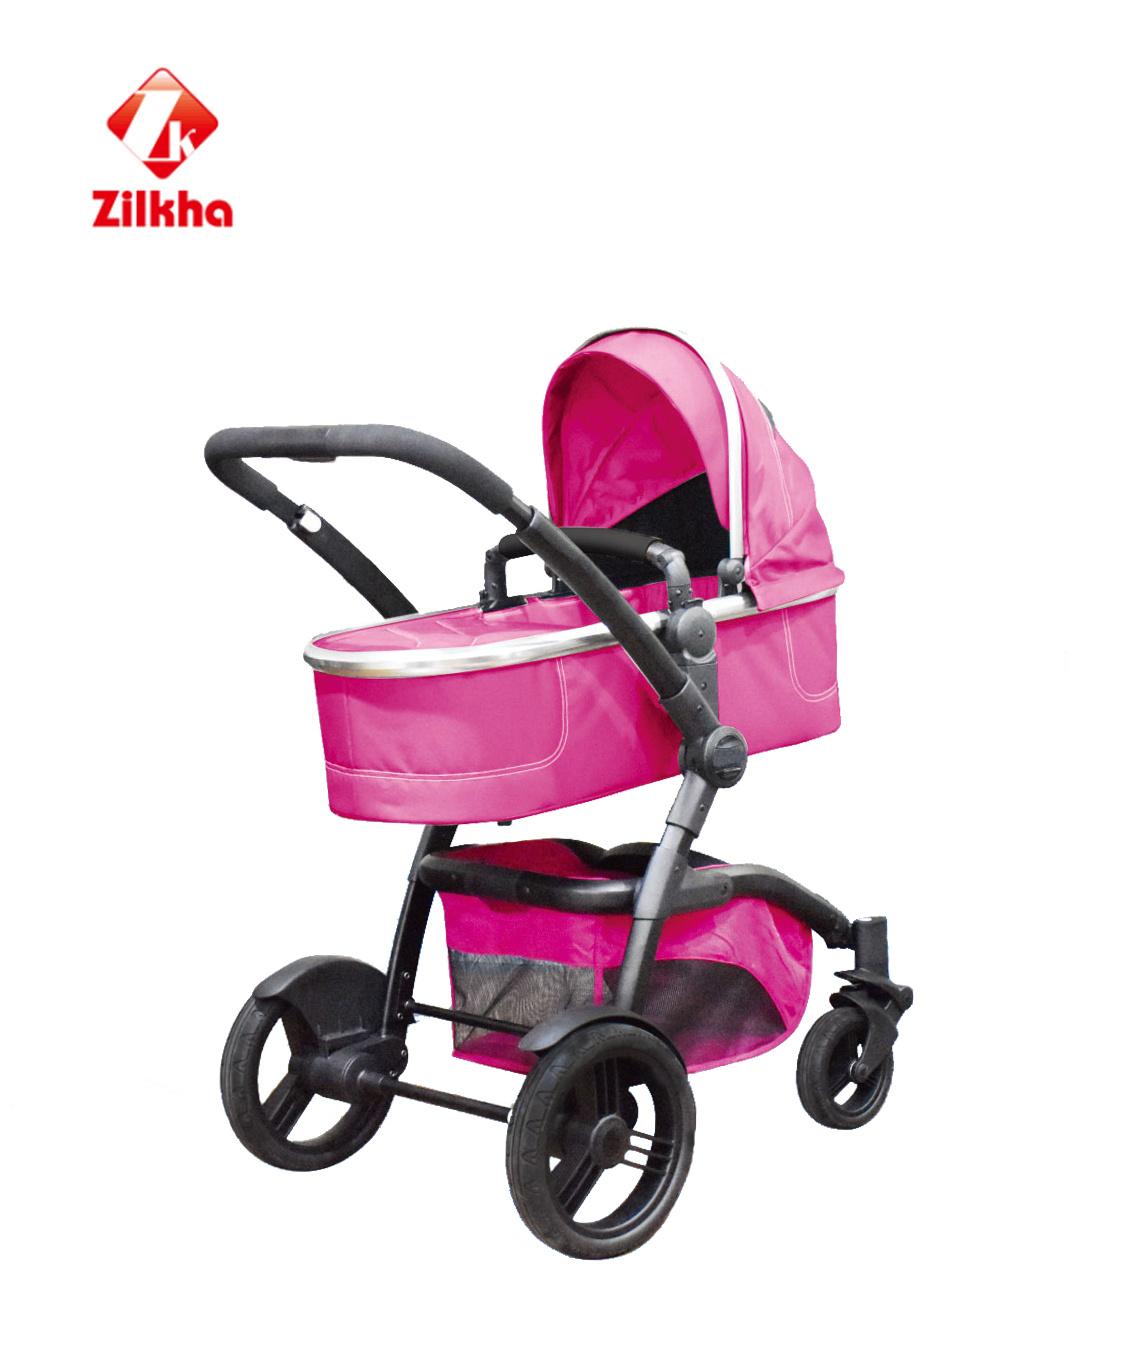 Portable Baby Stroller with En1888 Certificate